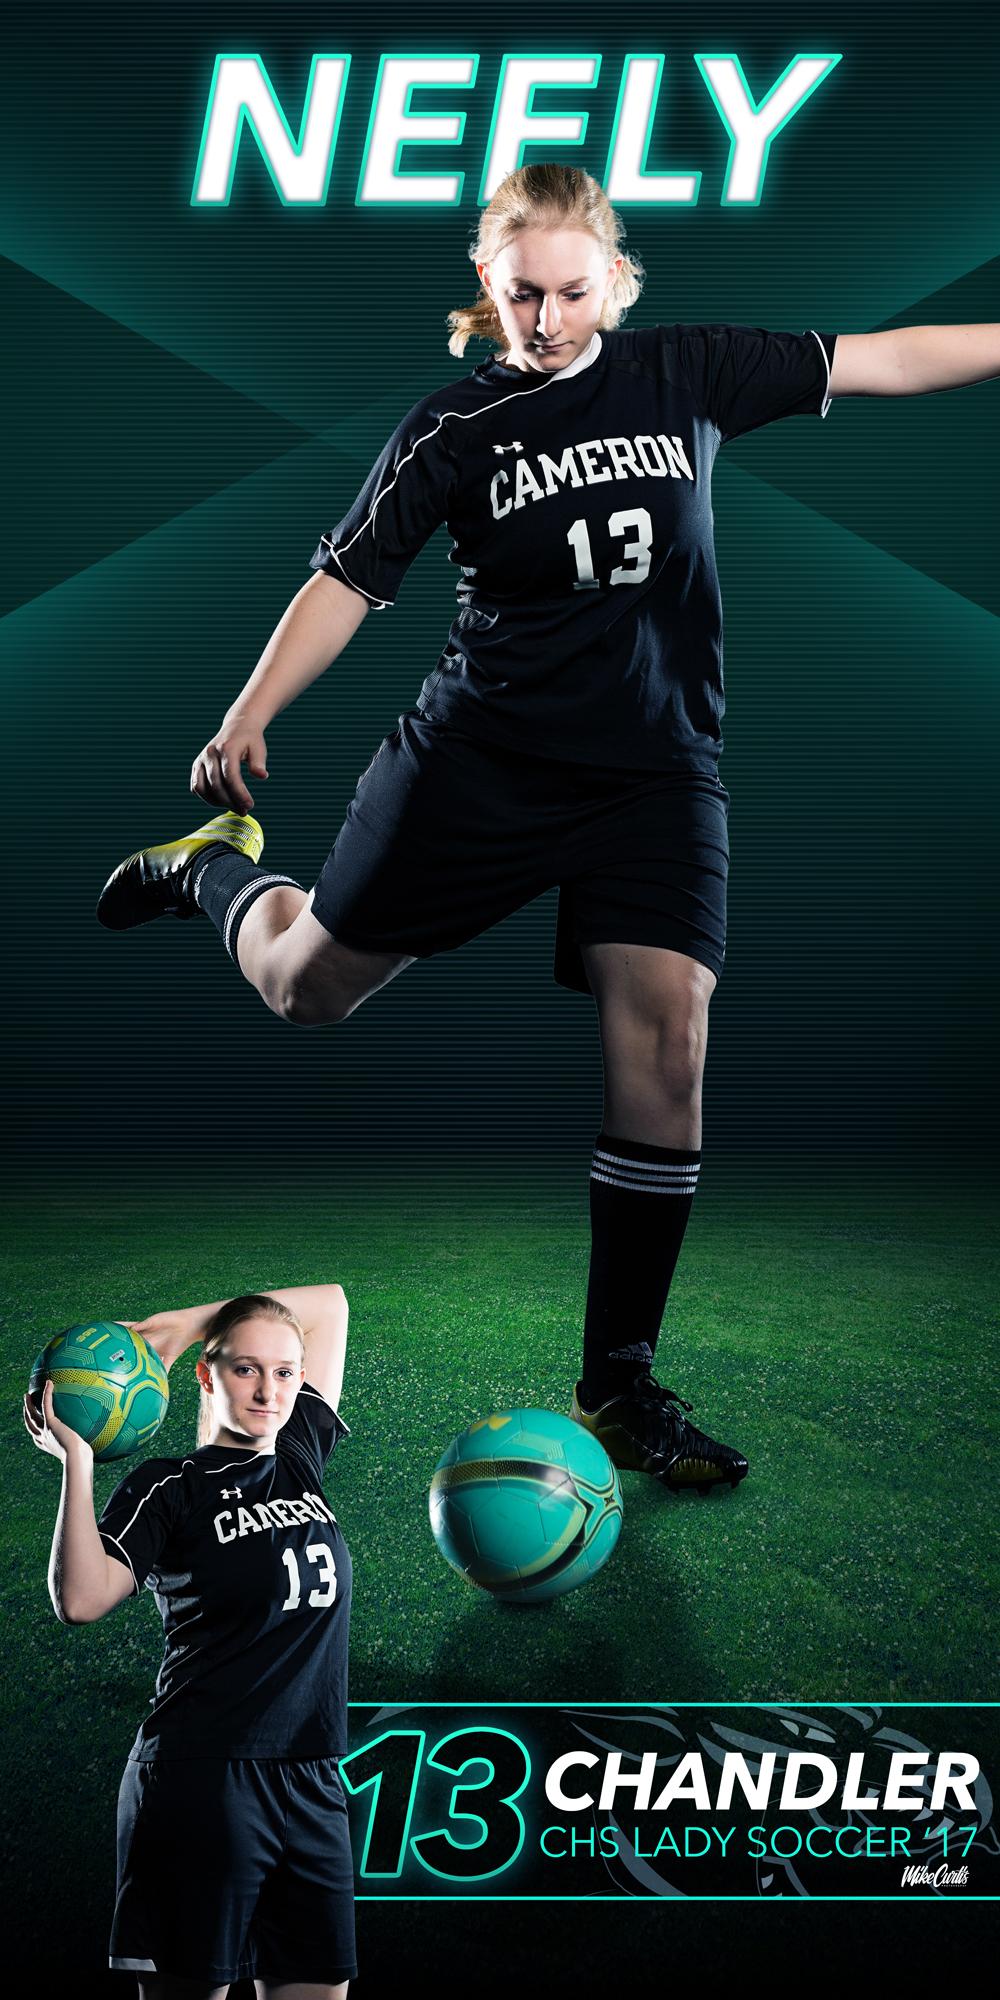 CHS-Lady-Soccer-17_Neely_2x4-Banner.jpg